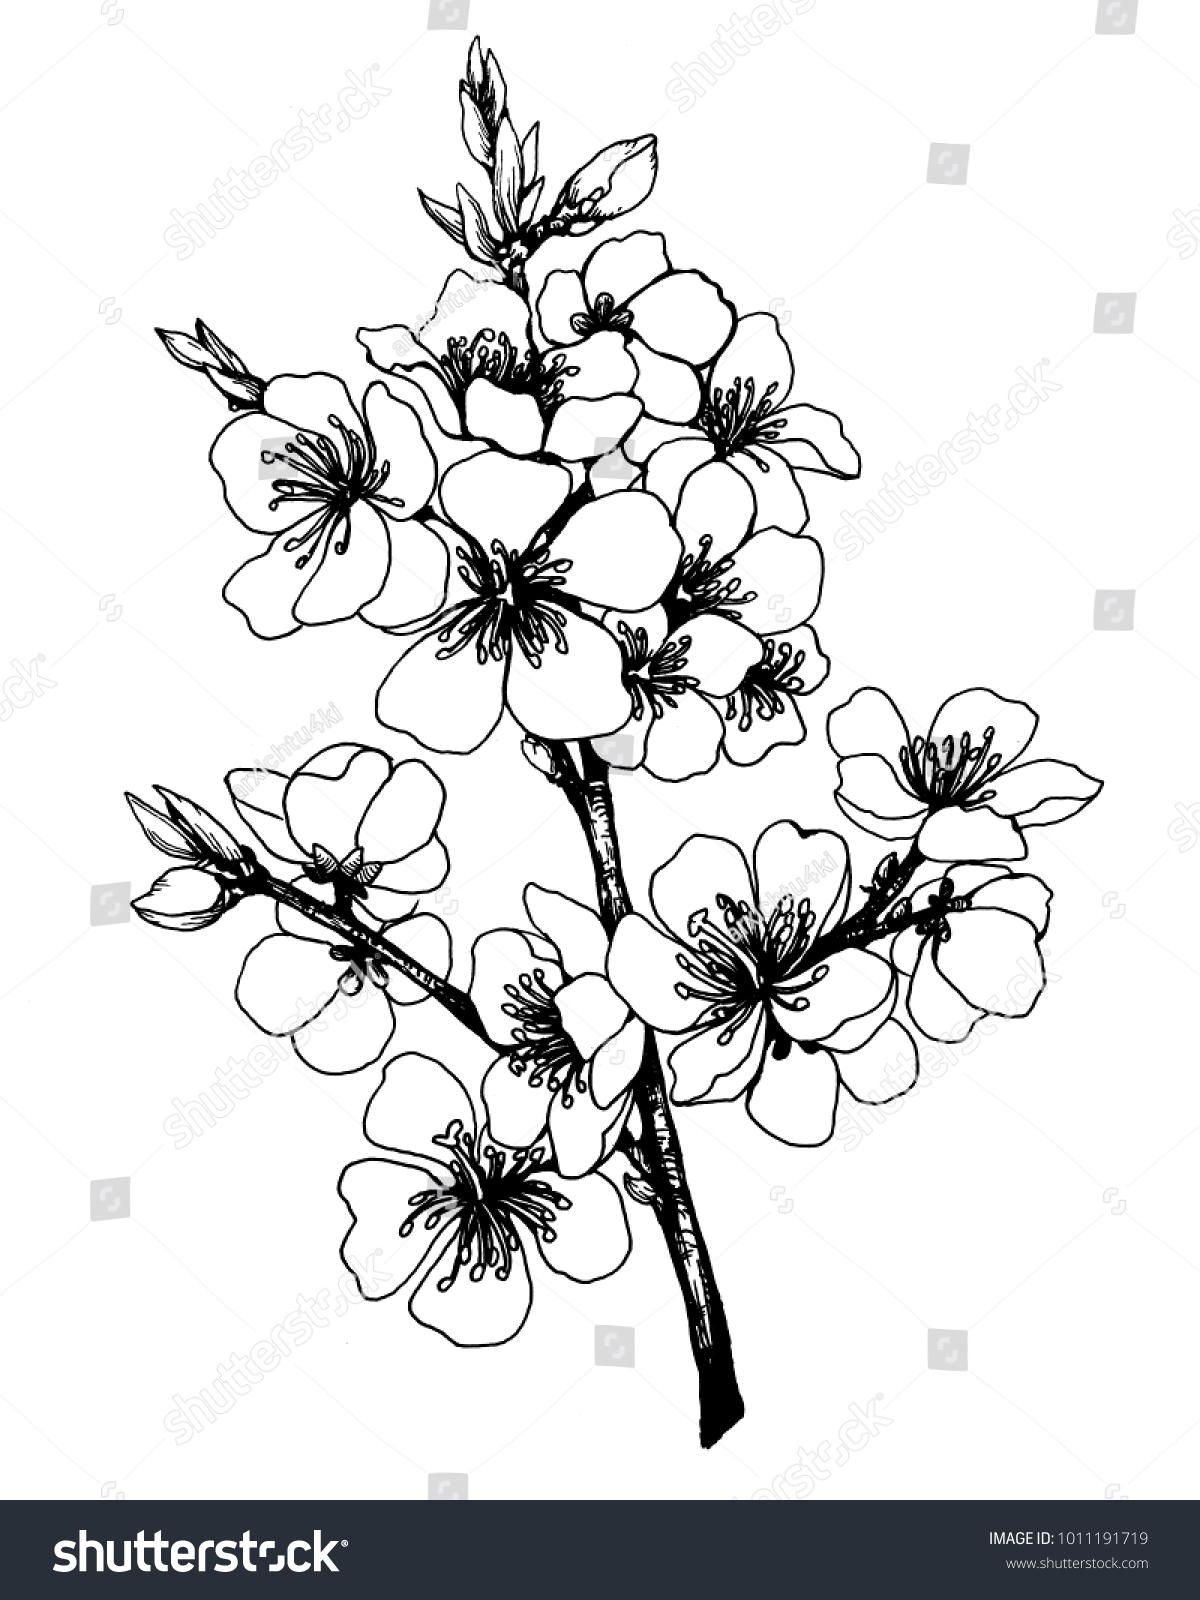 Branch Japan Cherry Sakura Flowers Black Stock Illustration